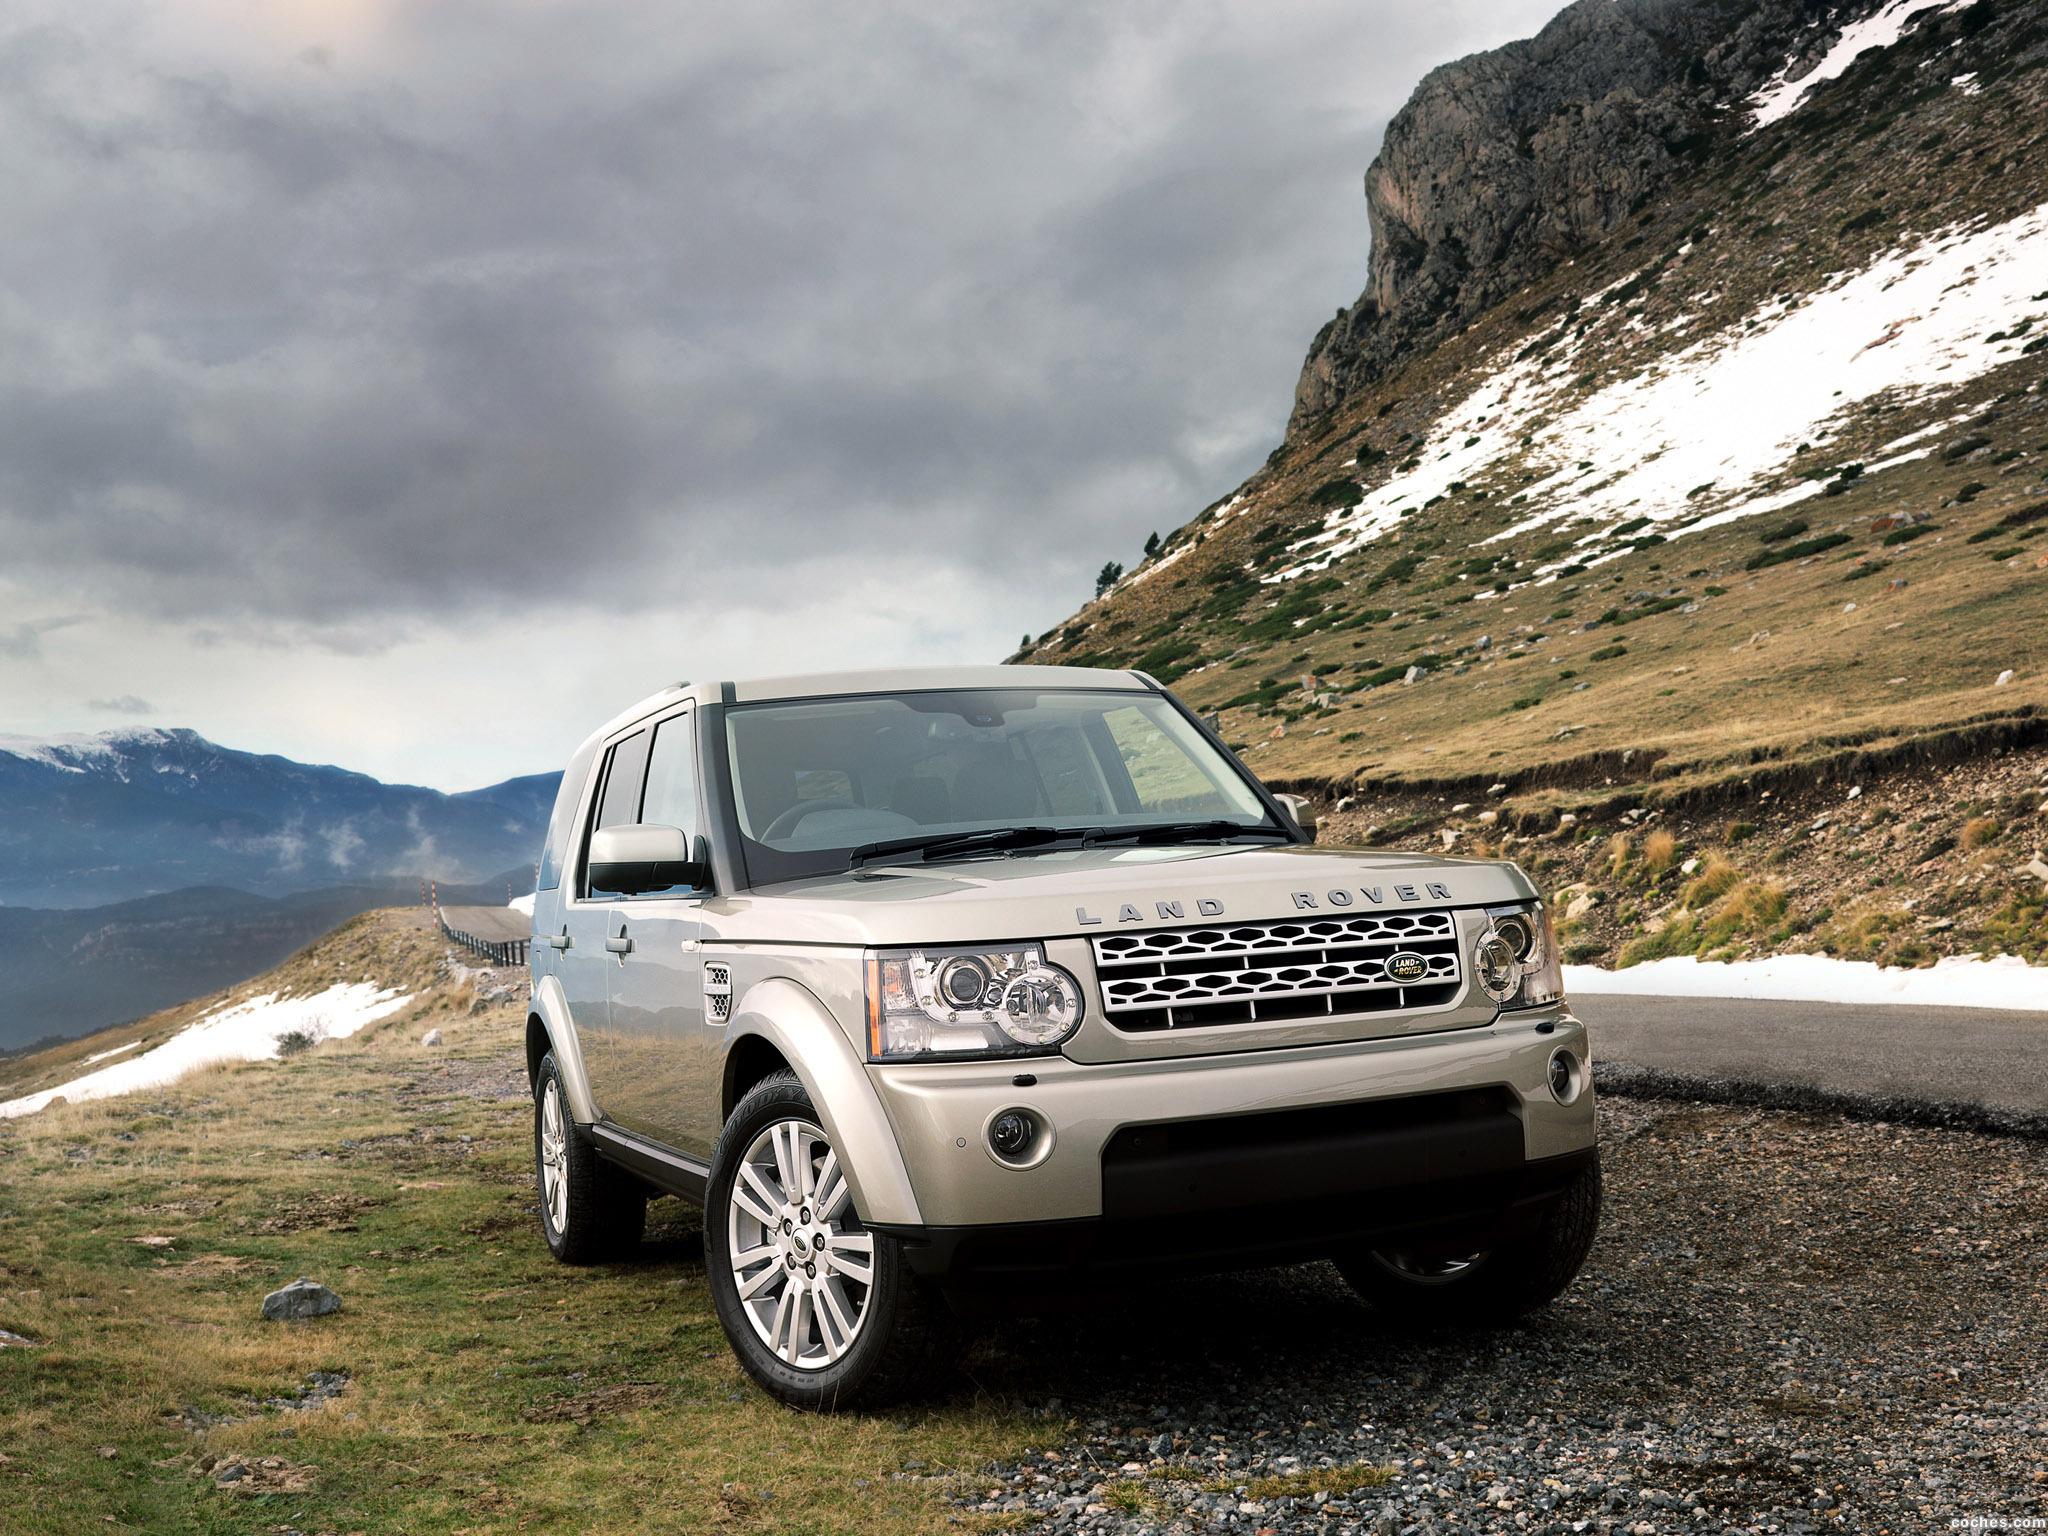 Foto 6 de  Land Rover Discovery 4 3.0 TDV6 2009